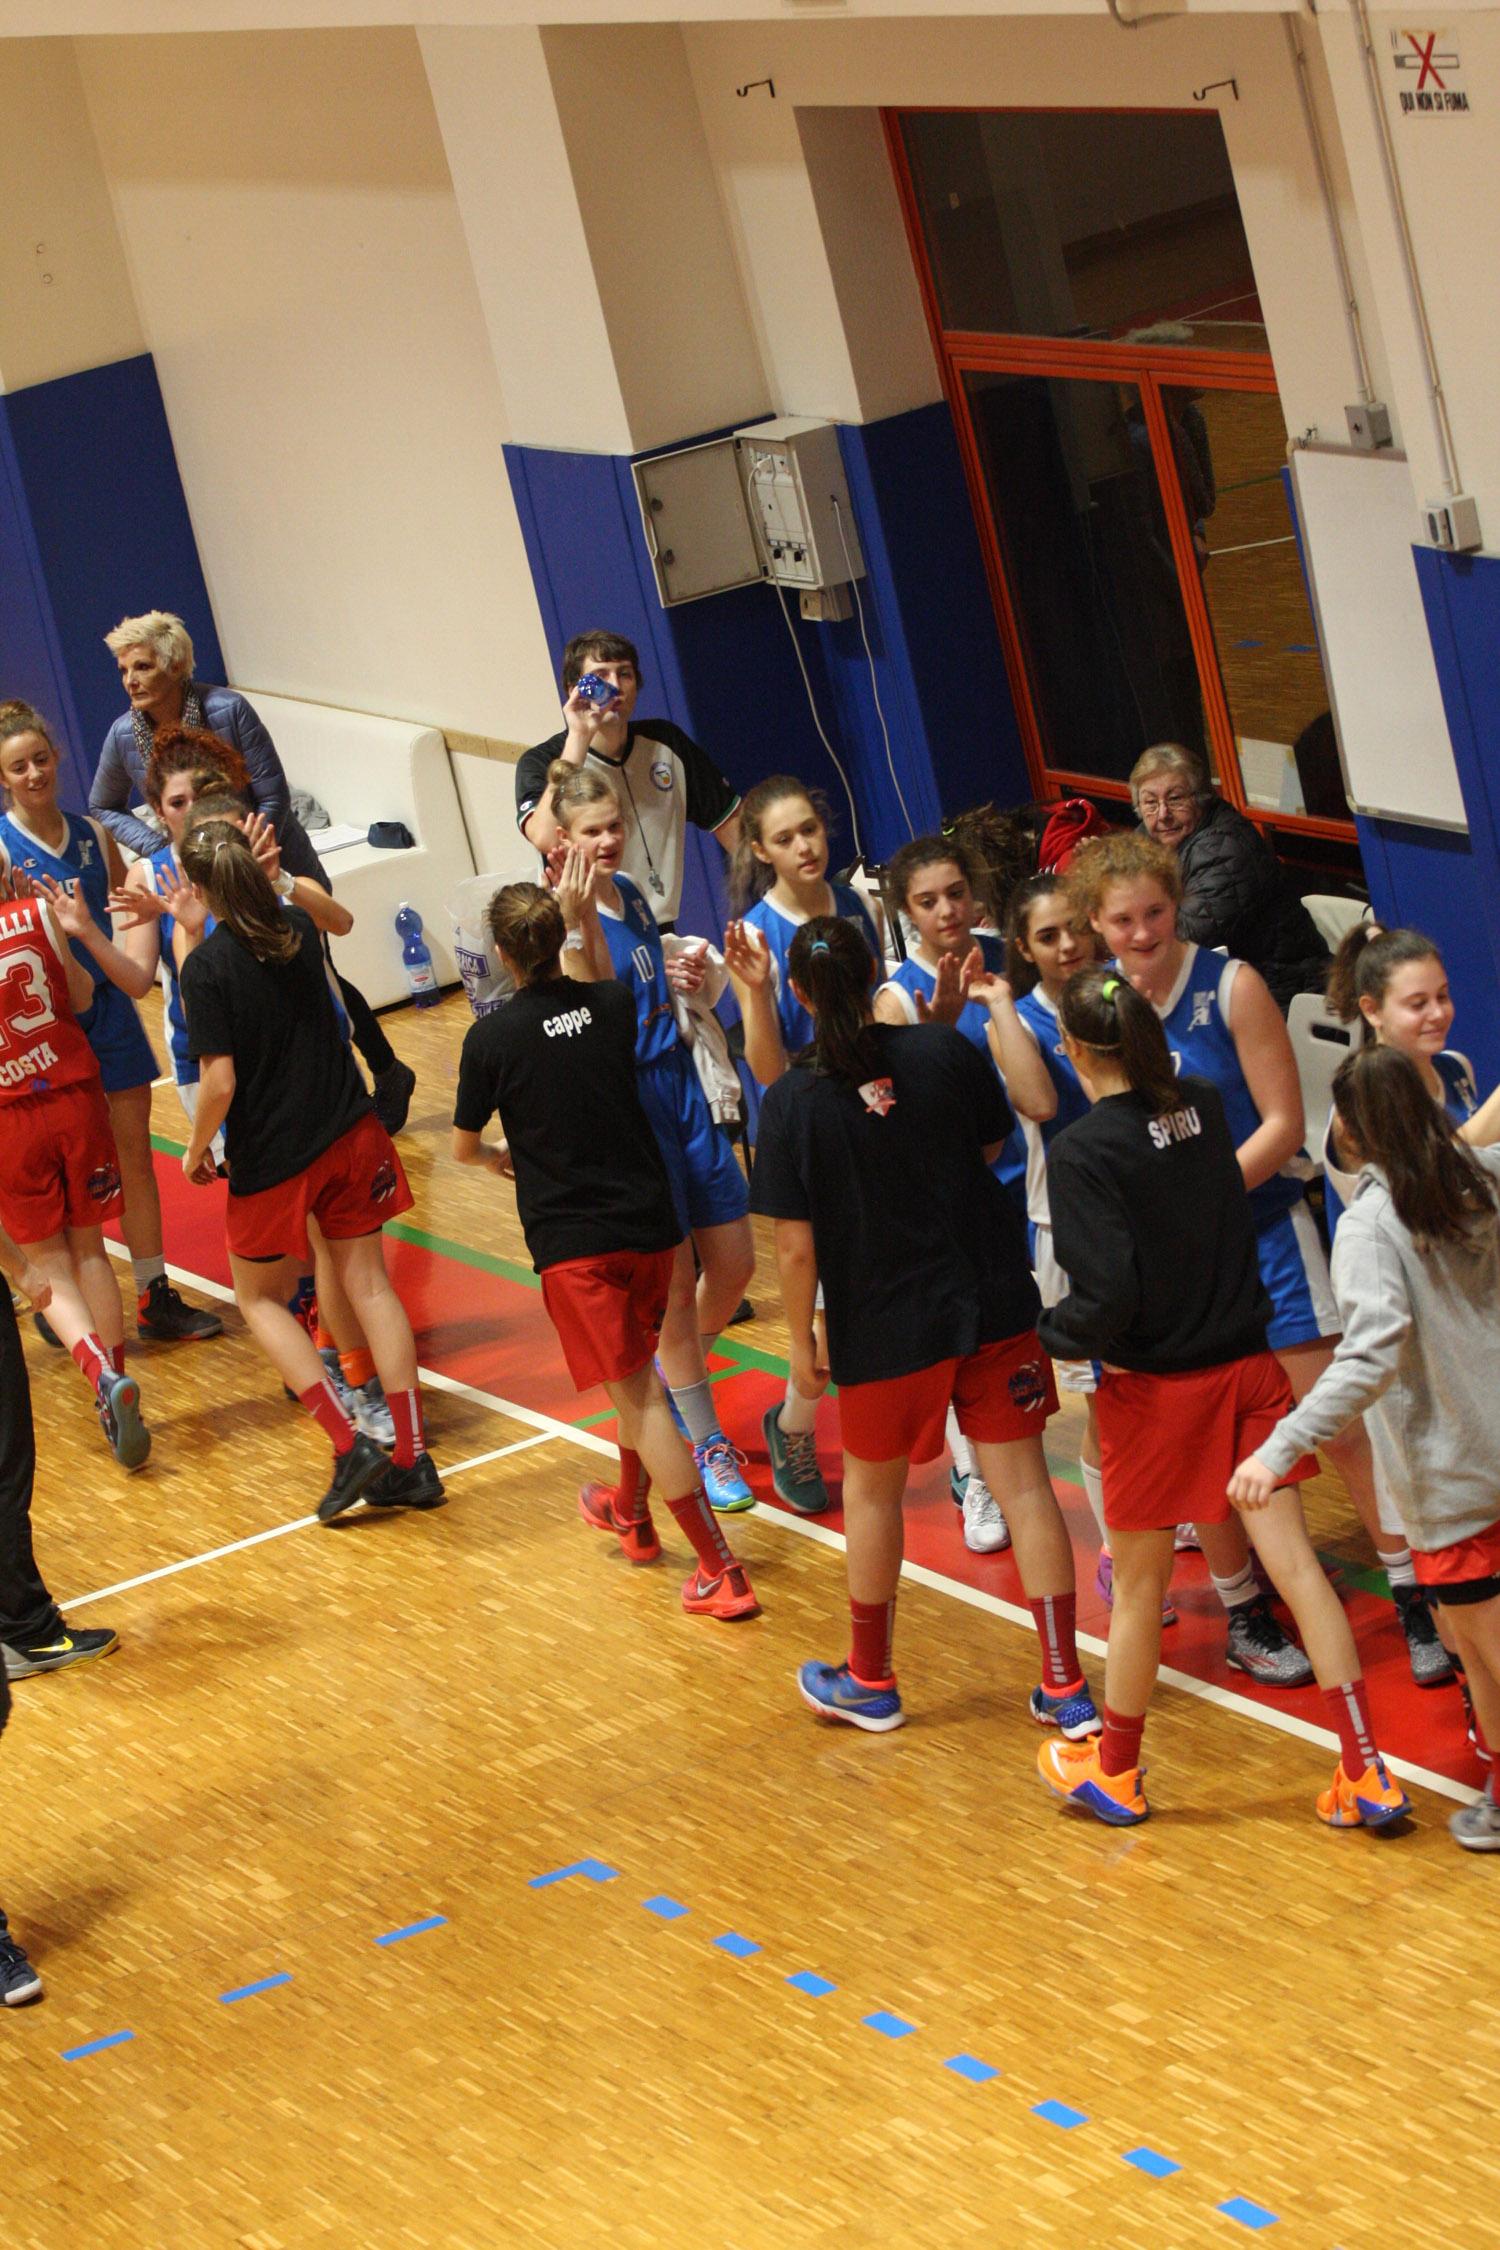 U16E - Costa Masnaga vs Baskettiamo Vittuone 2001 00048.jpg